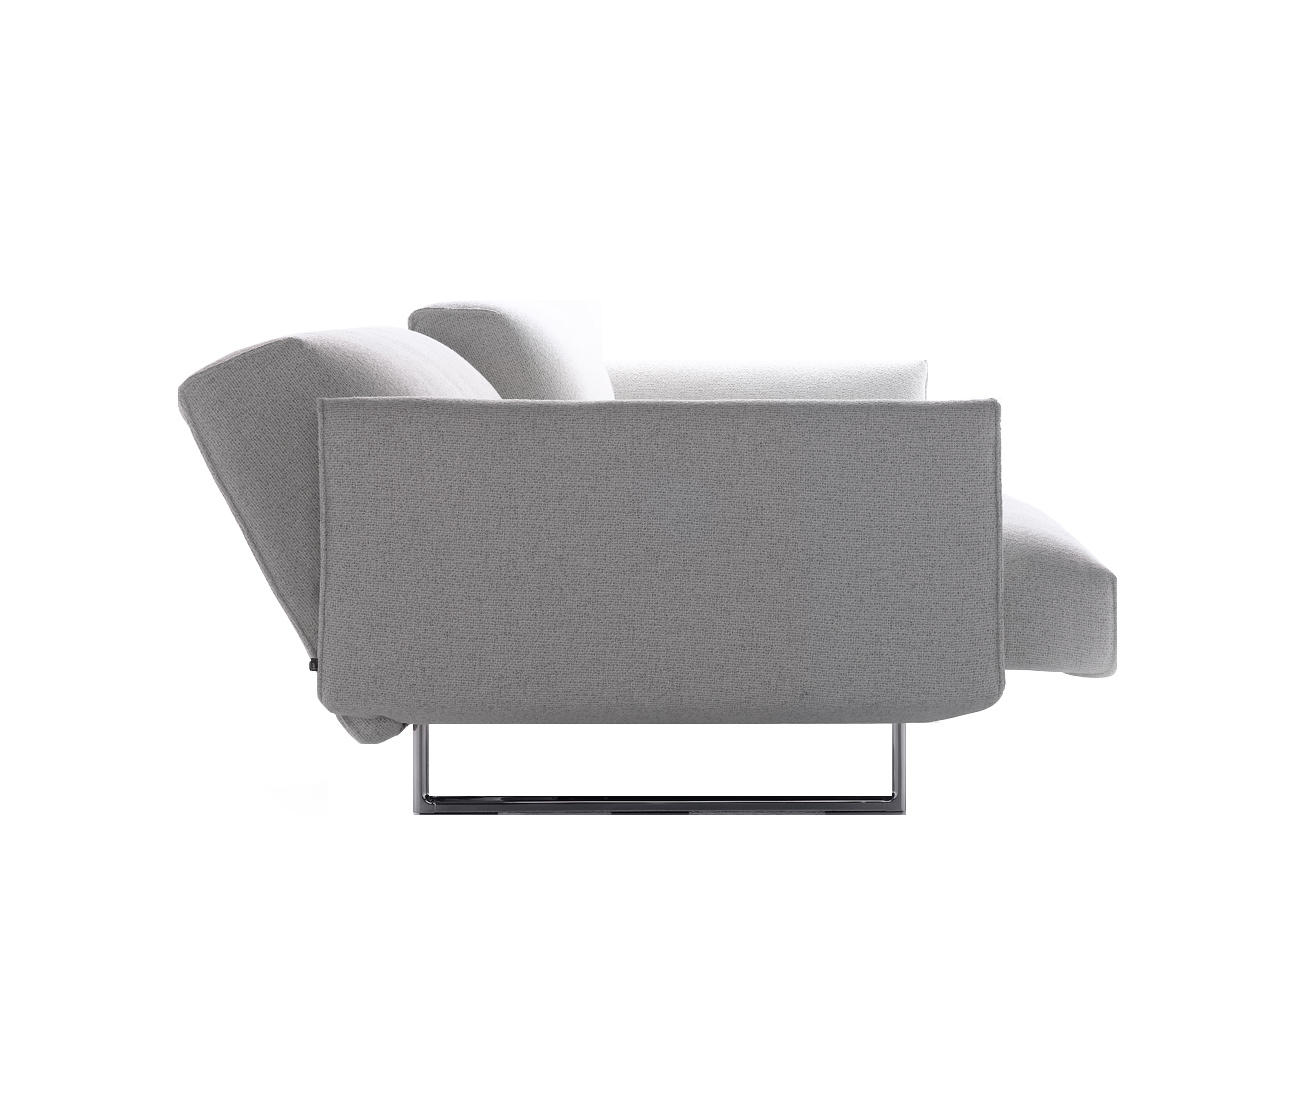 lc5 sofa price eco friendly australia hara sofas from mdf italia architonic